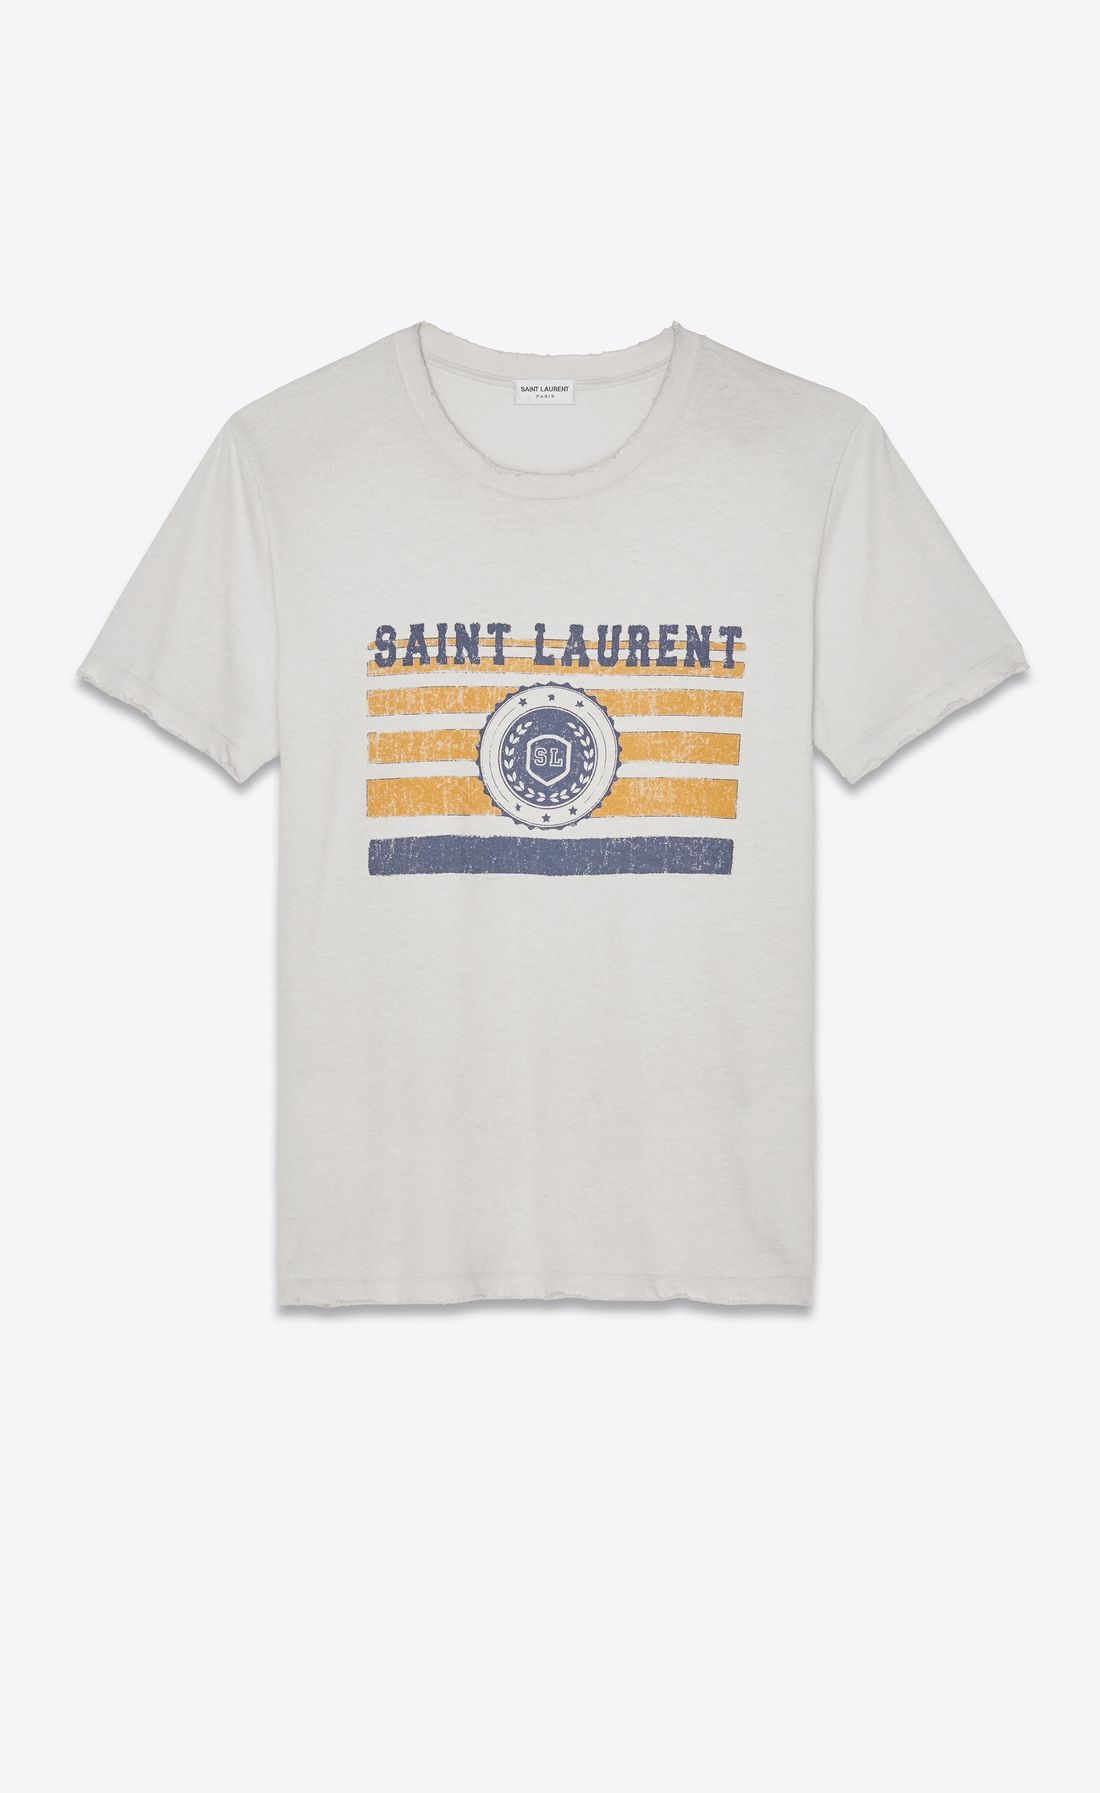 49ebe01046d5 SAINT LAURENT T-Shirt and Jersey Woman Boyfriend Saint Laurent University T- shirt in off-white jersey V4